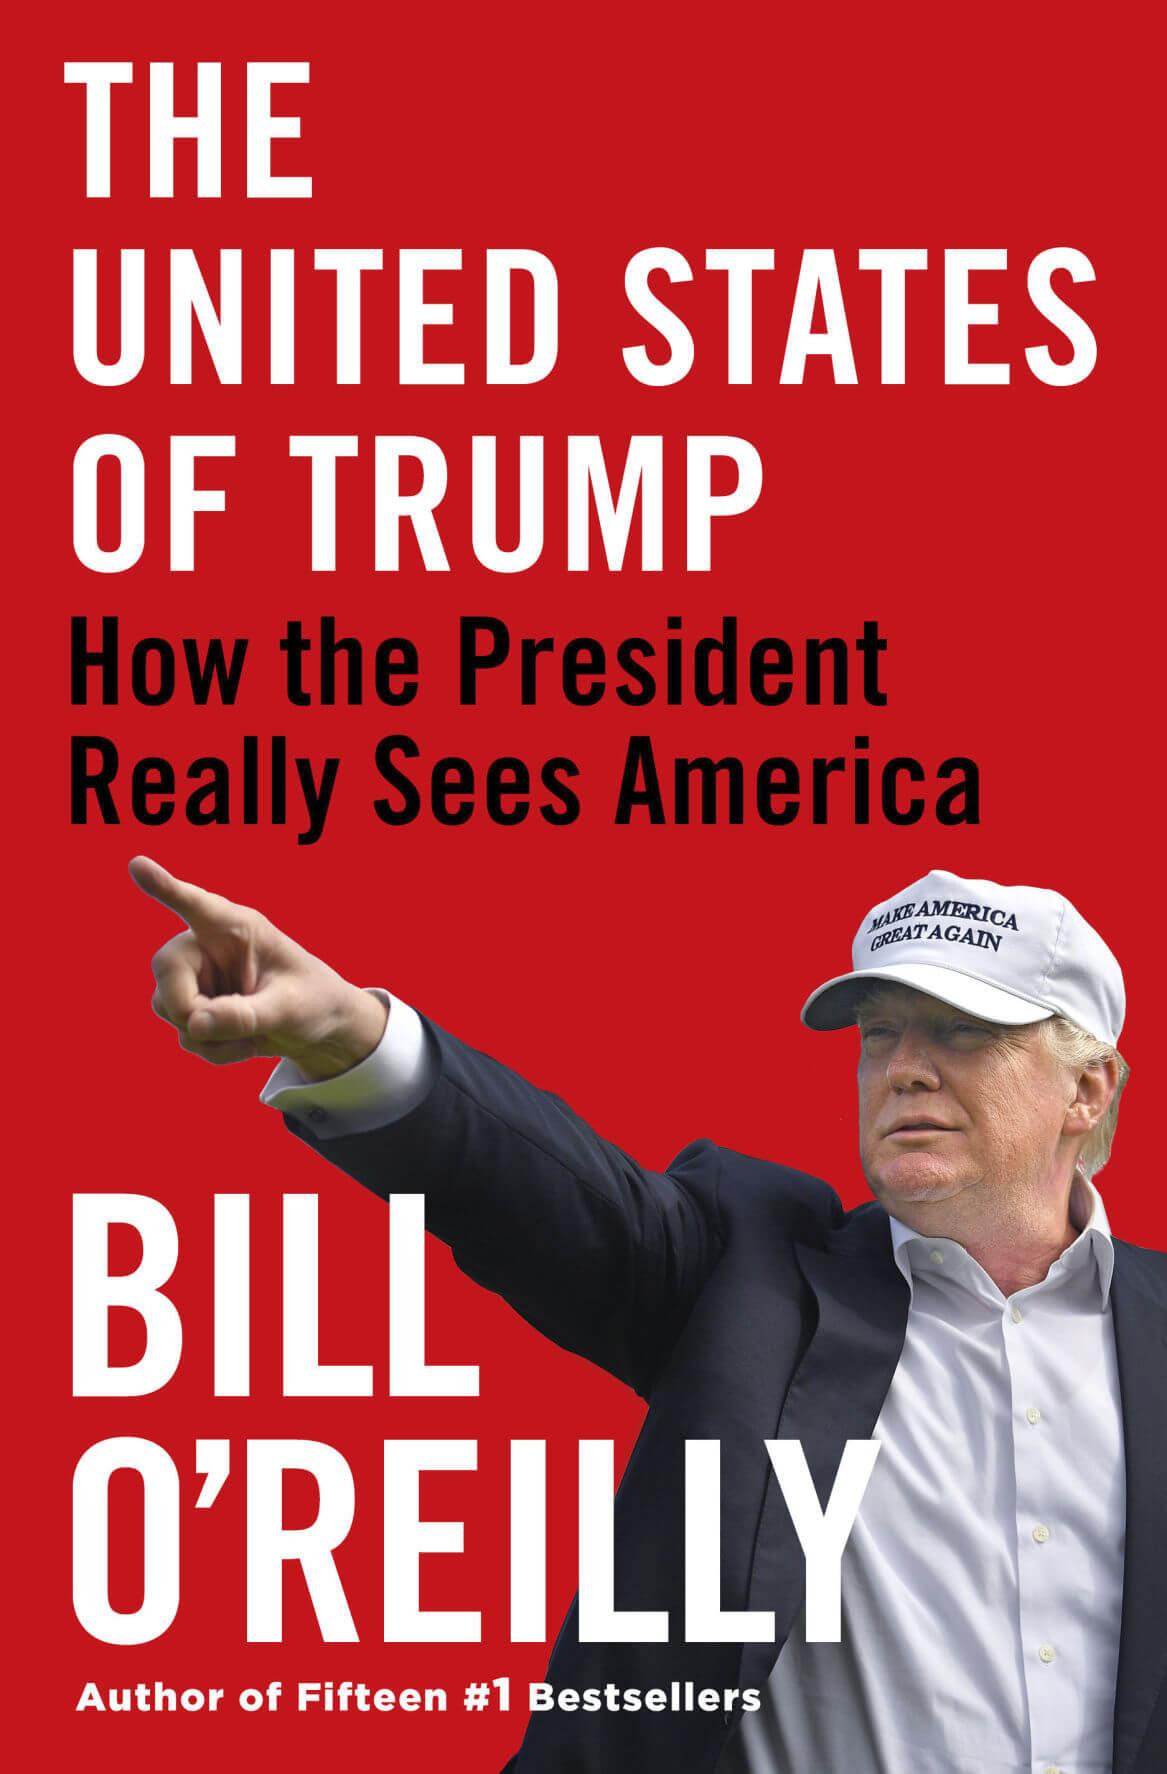 bill trump states united reilly oreilly written series author tvweek killing million lincoln kennedy